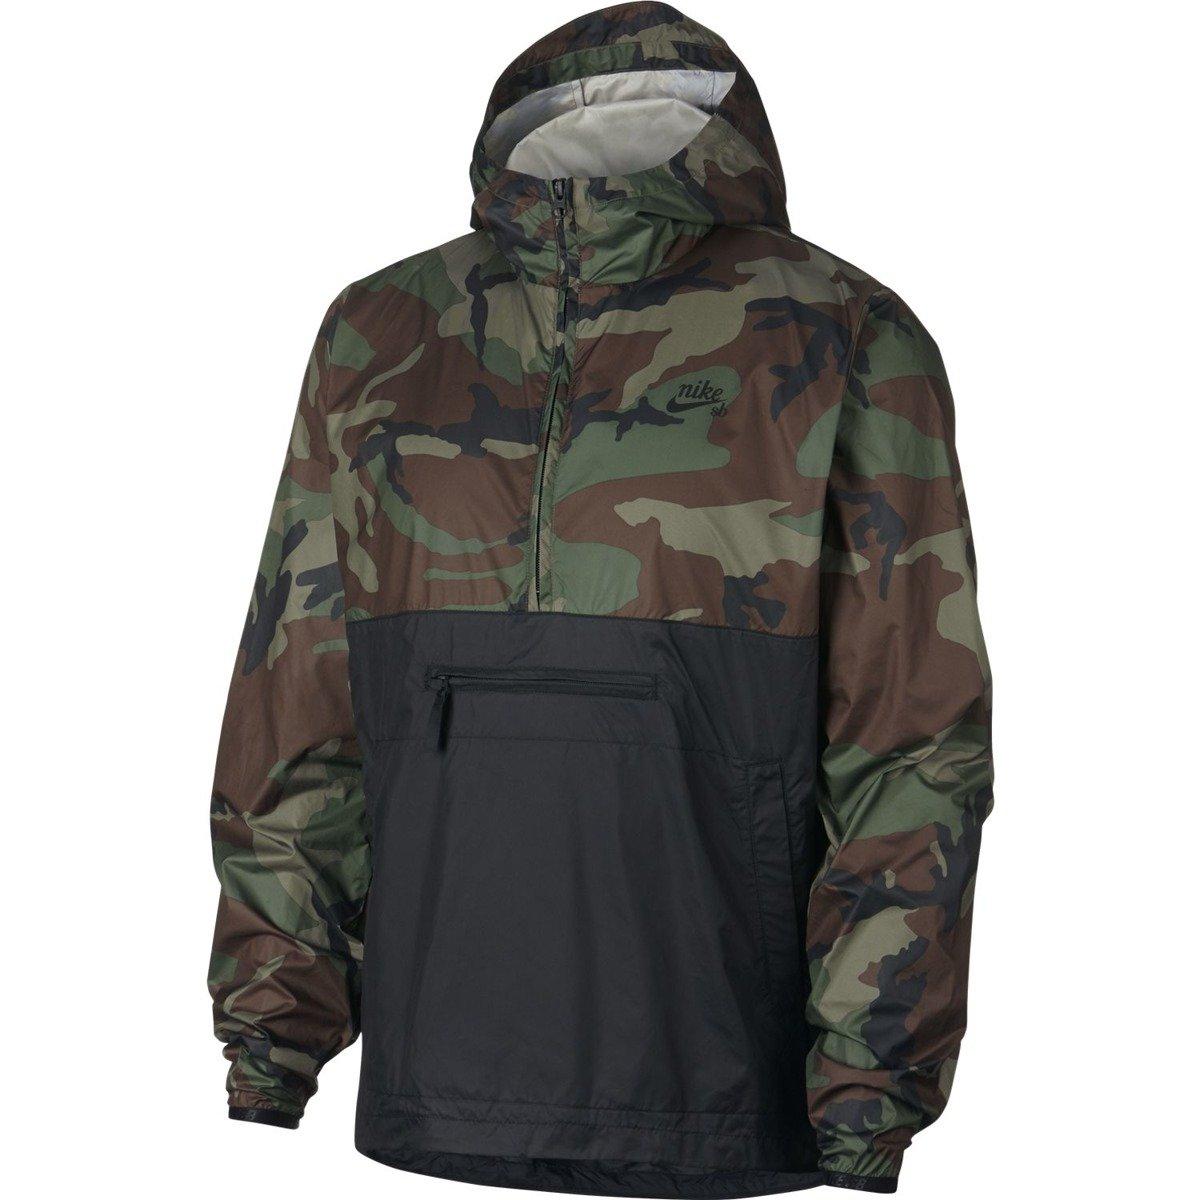 b8506779d Miniramp Skateshop nike sb Anorak Jacket Camo Medium Olive/black/black